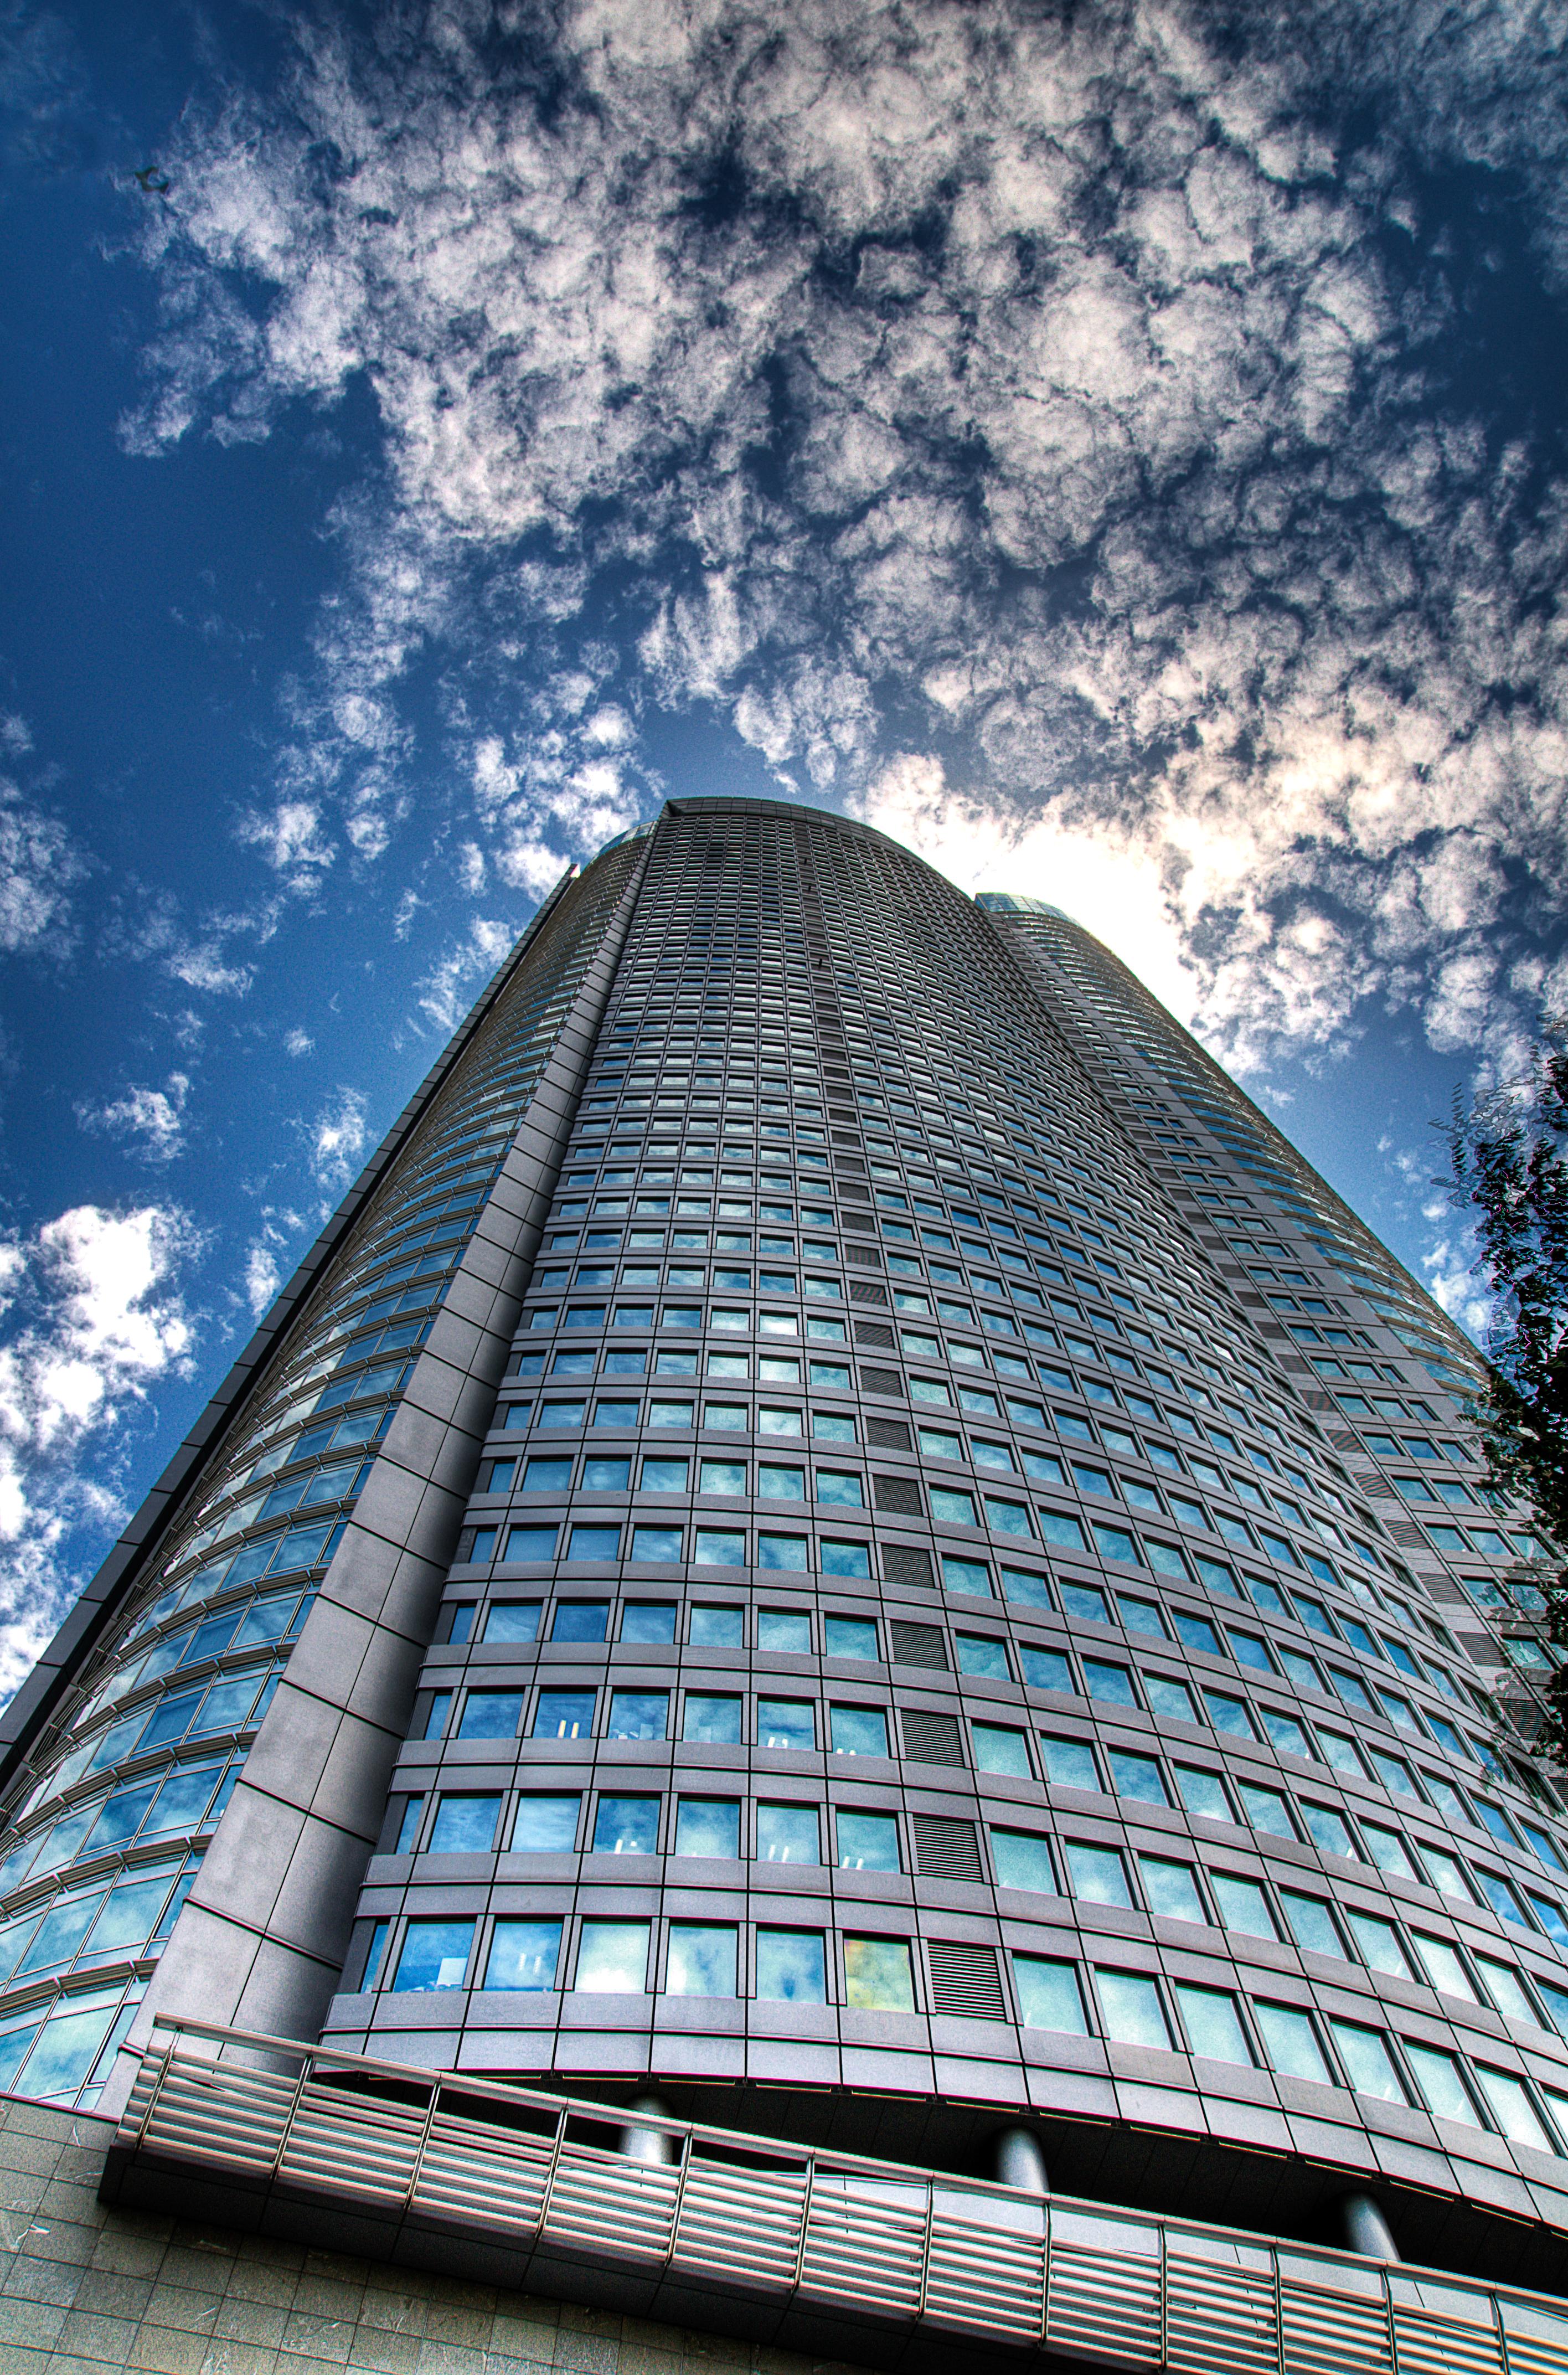 Roppongi Tower